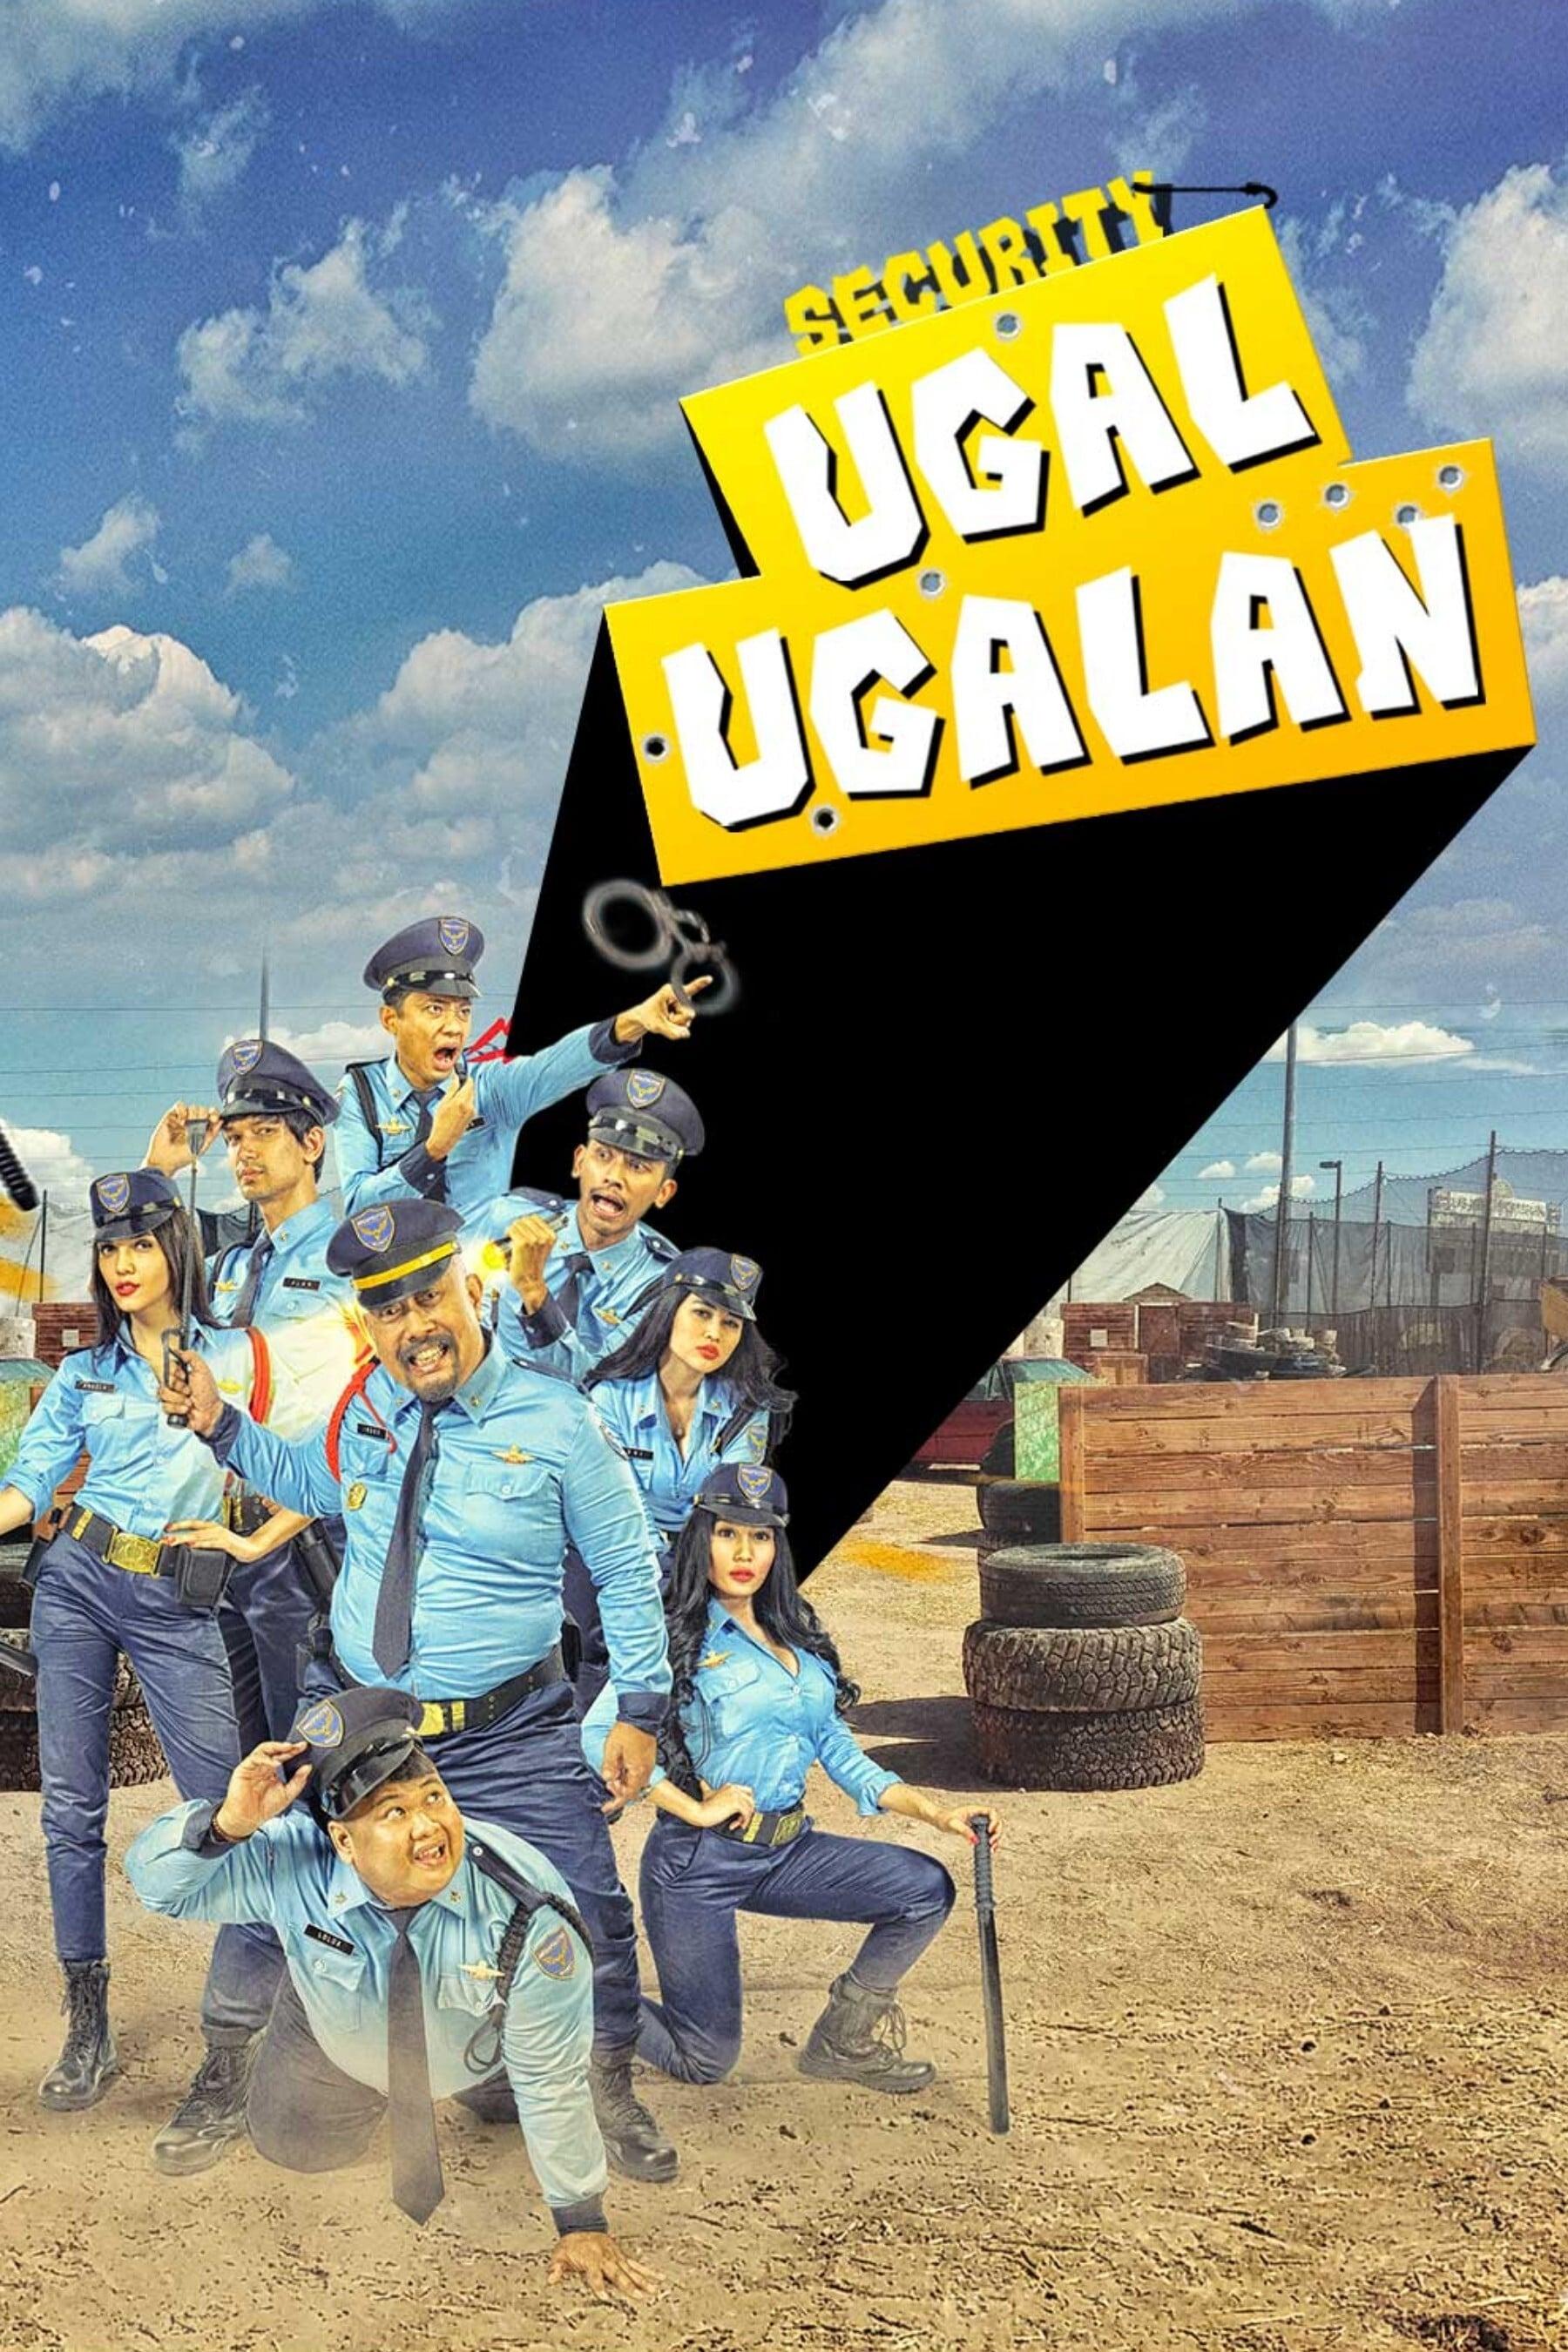 Security Ugal-ugalan : security, ugal-ugalan, Security, Ugal-Ugalan, (2017), Posters, Movie, Database, (TMDb)